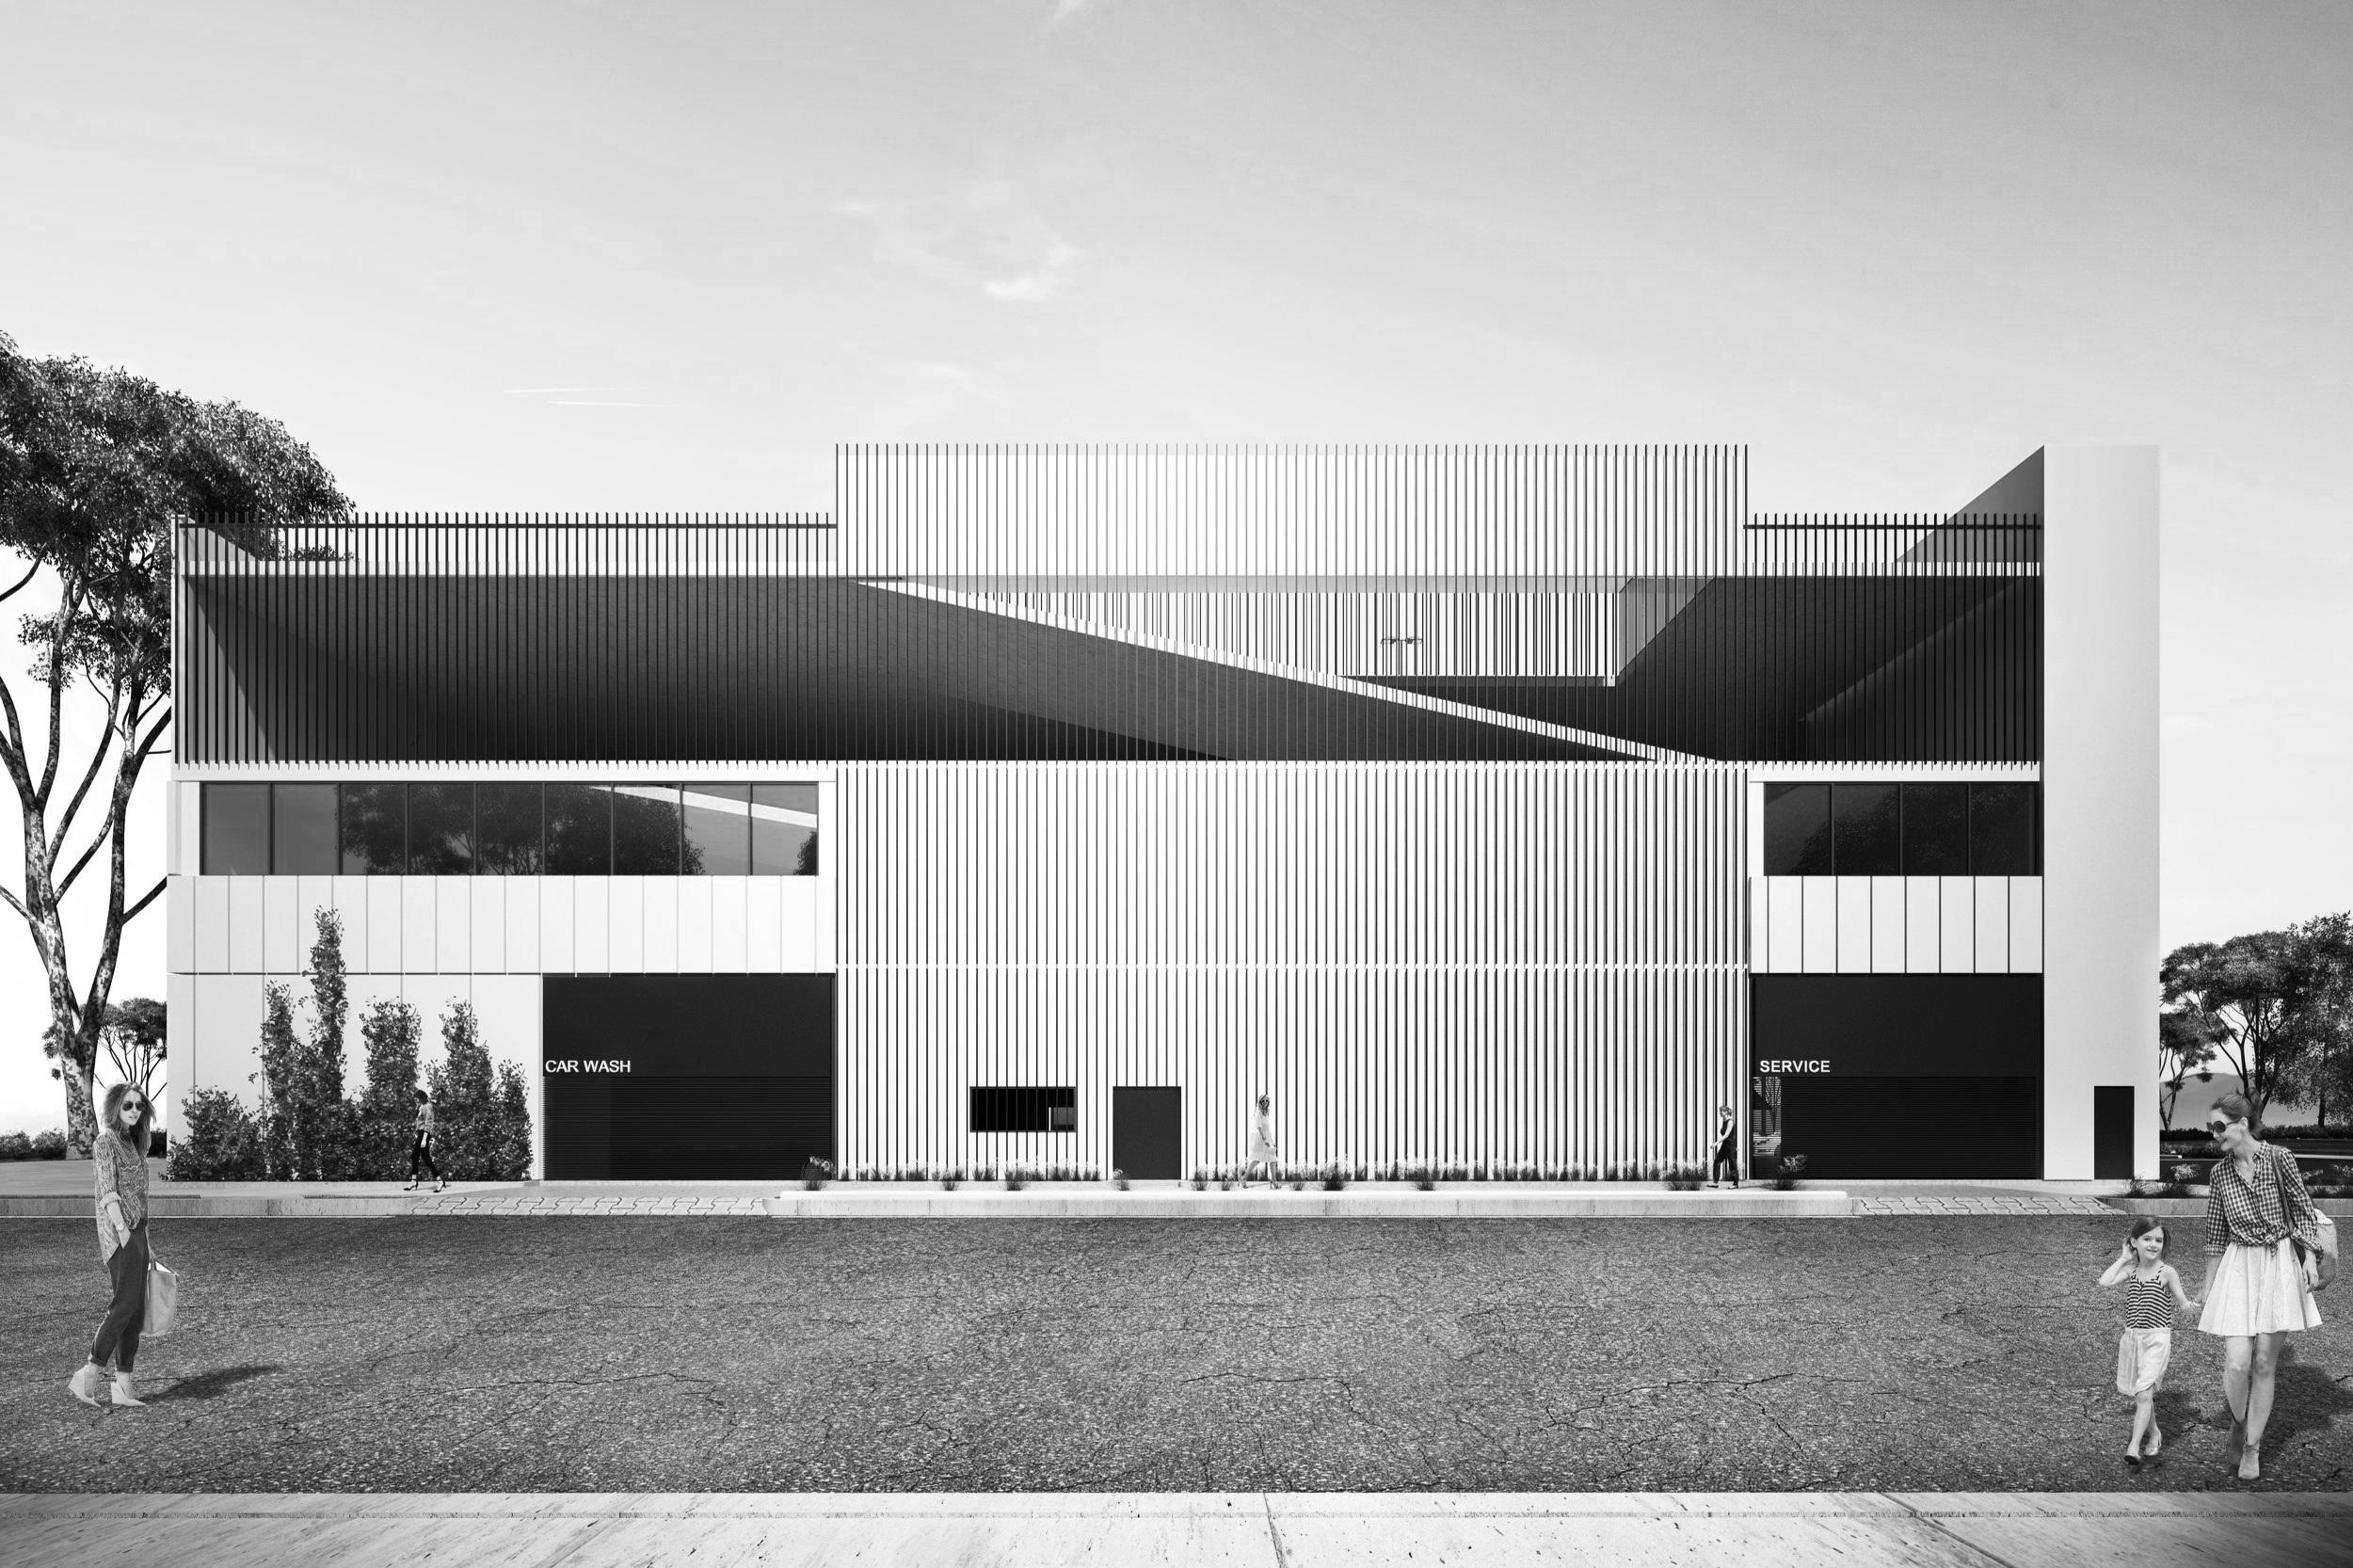 Glendale Showroom and Car Storage - Location / Glendale, CaliforniaArchitect / Bill James and Associates ArchitectsSize / c.90,000 SFStatus / In progress